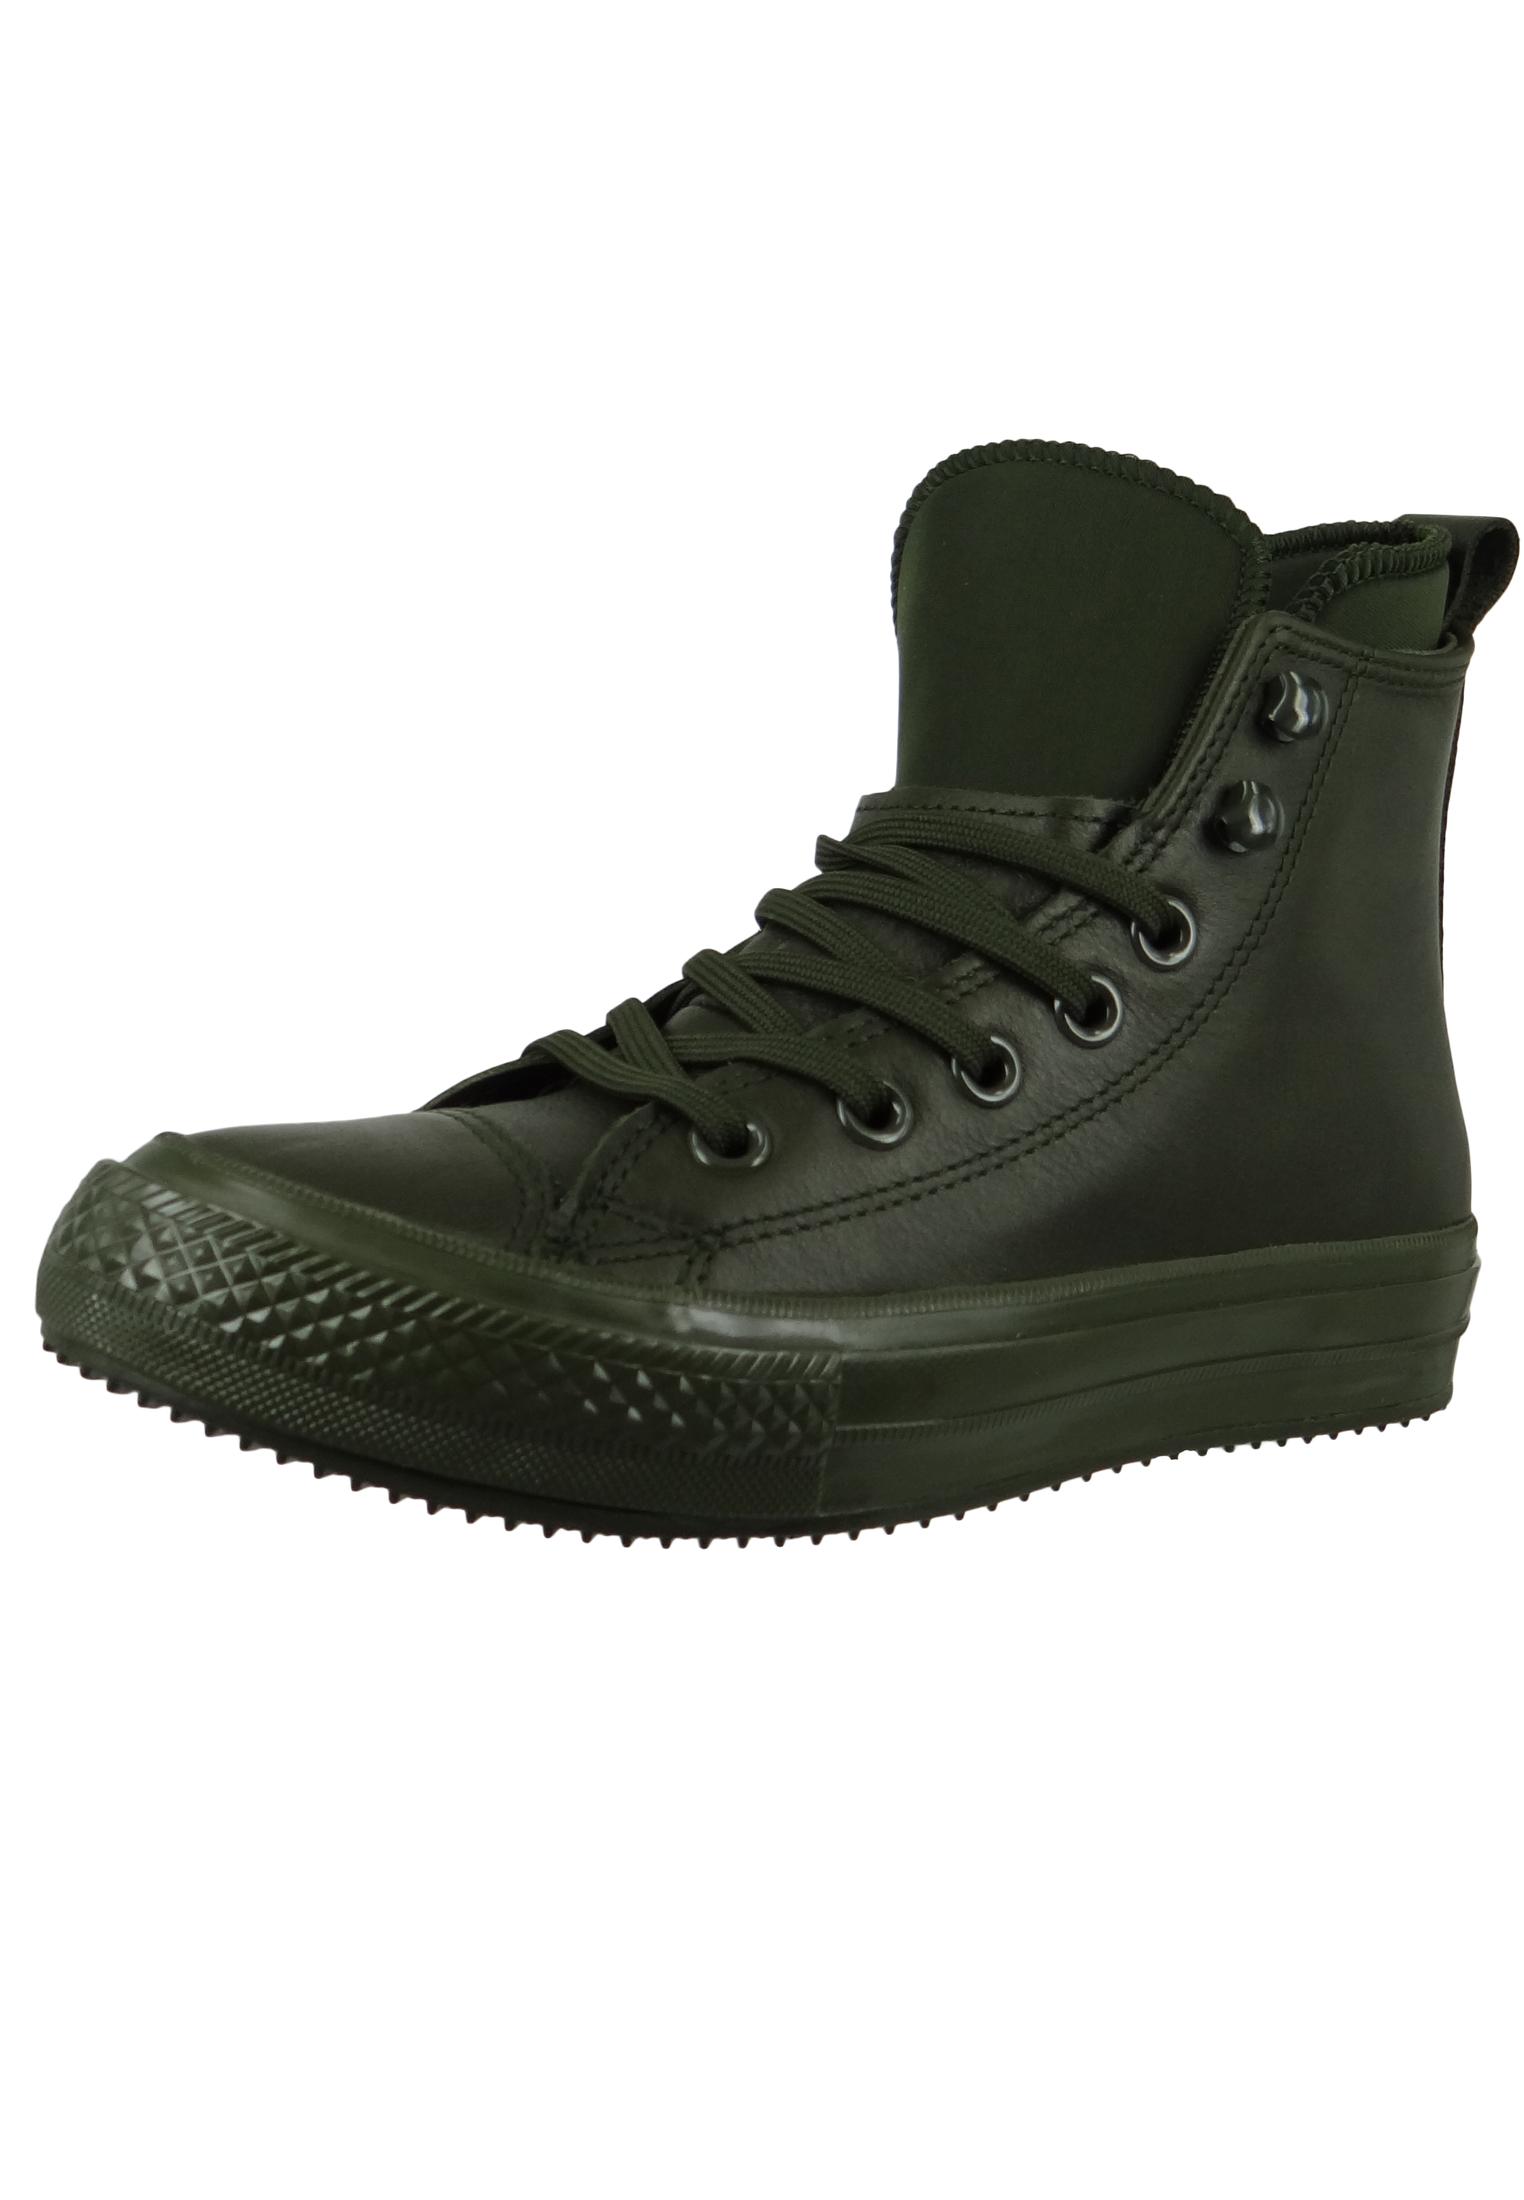 0a8e2e0aa263d ... spain converse chucks 162501c grün leder chuck taylor all star wp boot  utitlity green 78b8c 7769f